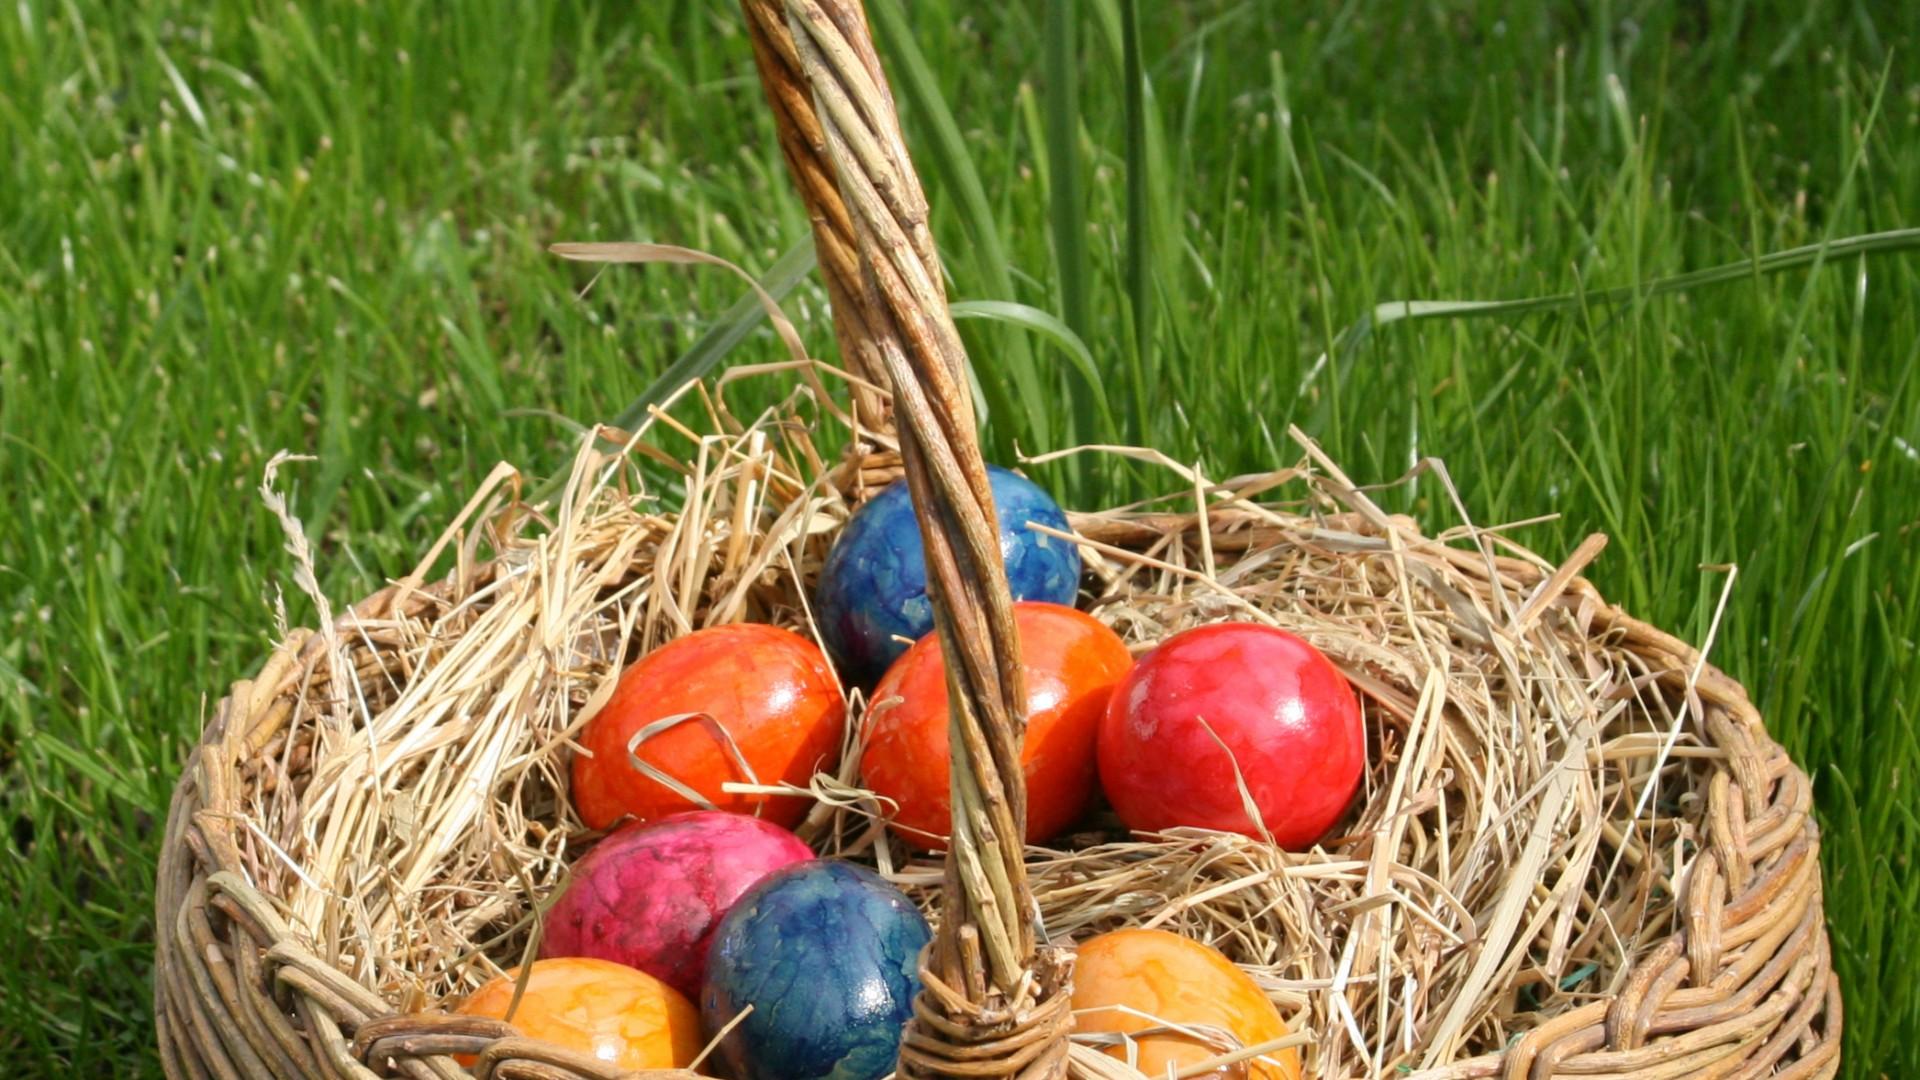 Basket Full Of Easter Eggs Wallpaper Hd Wallpapers